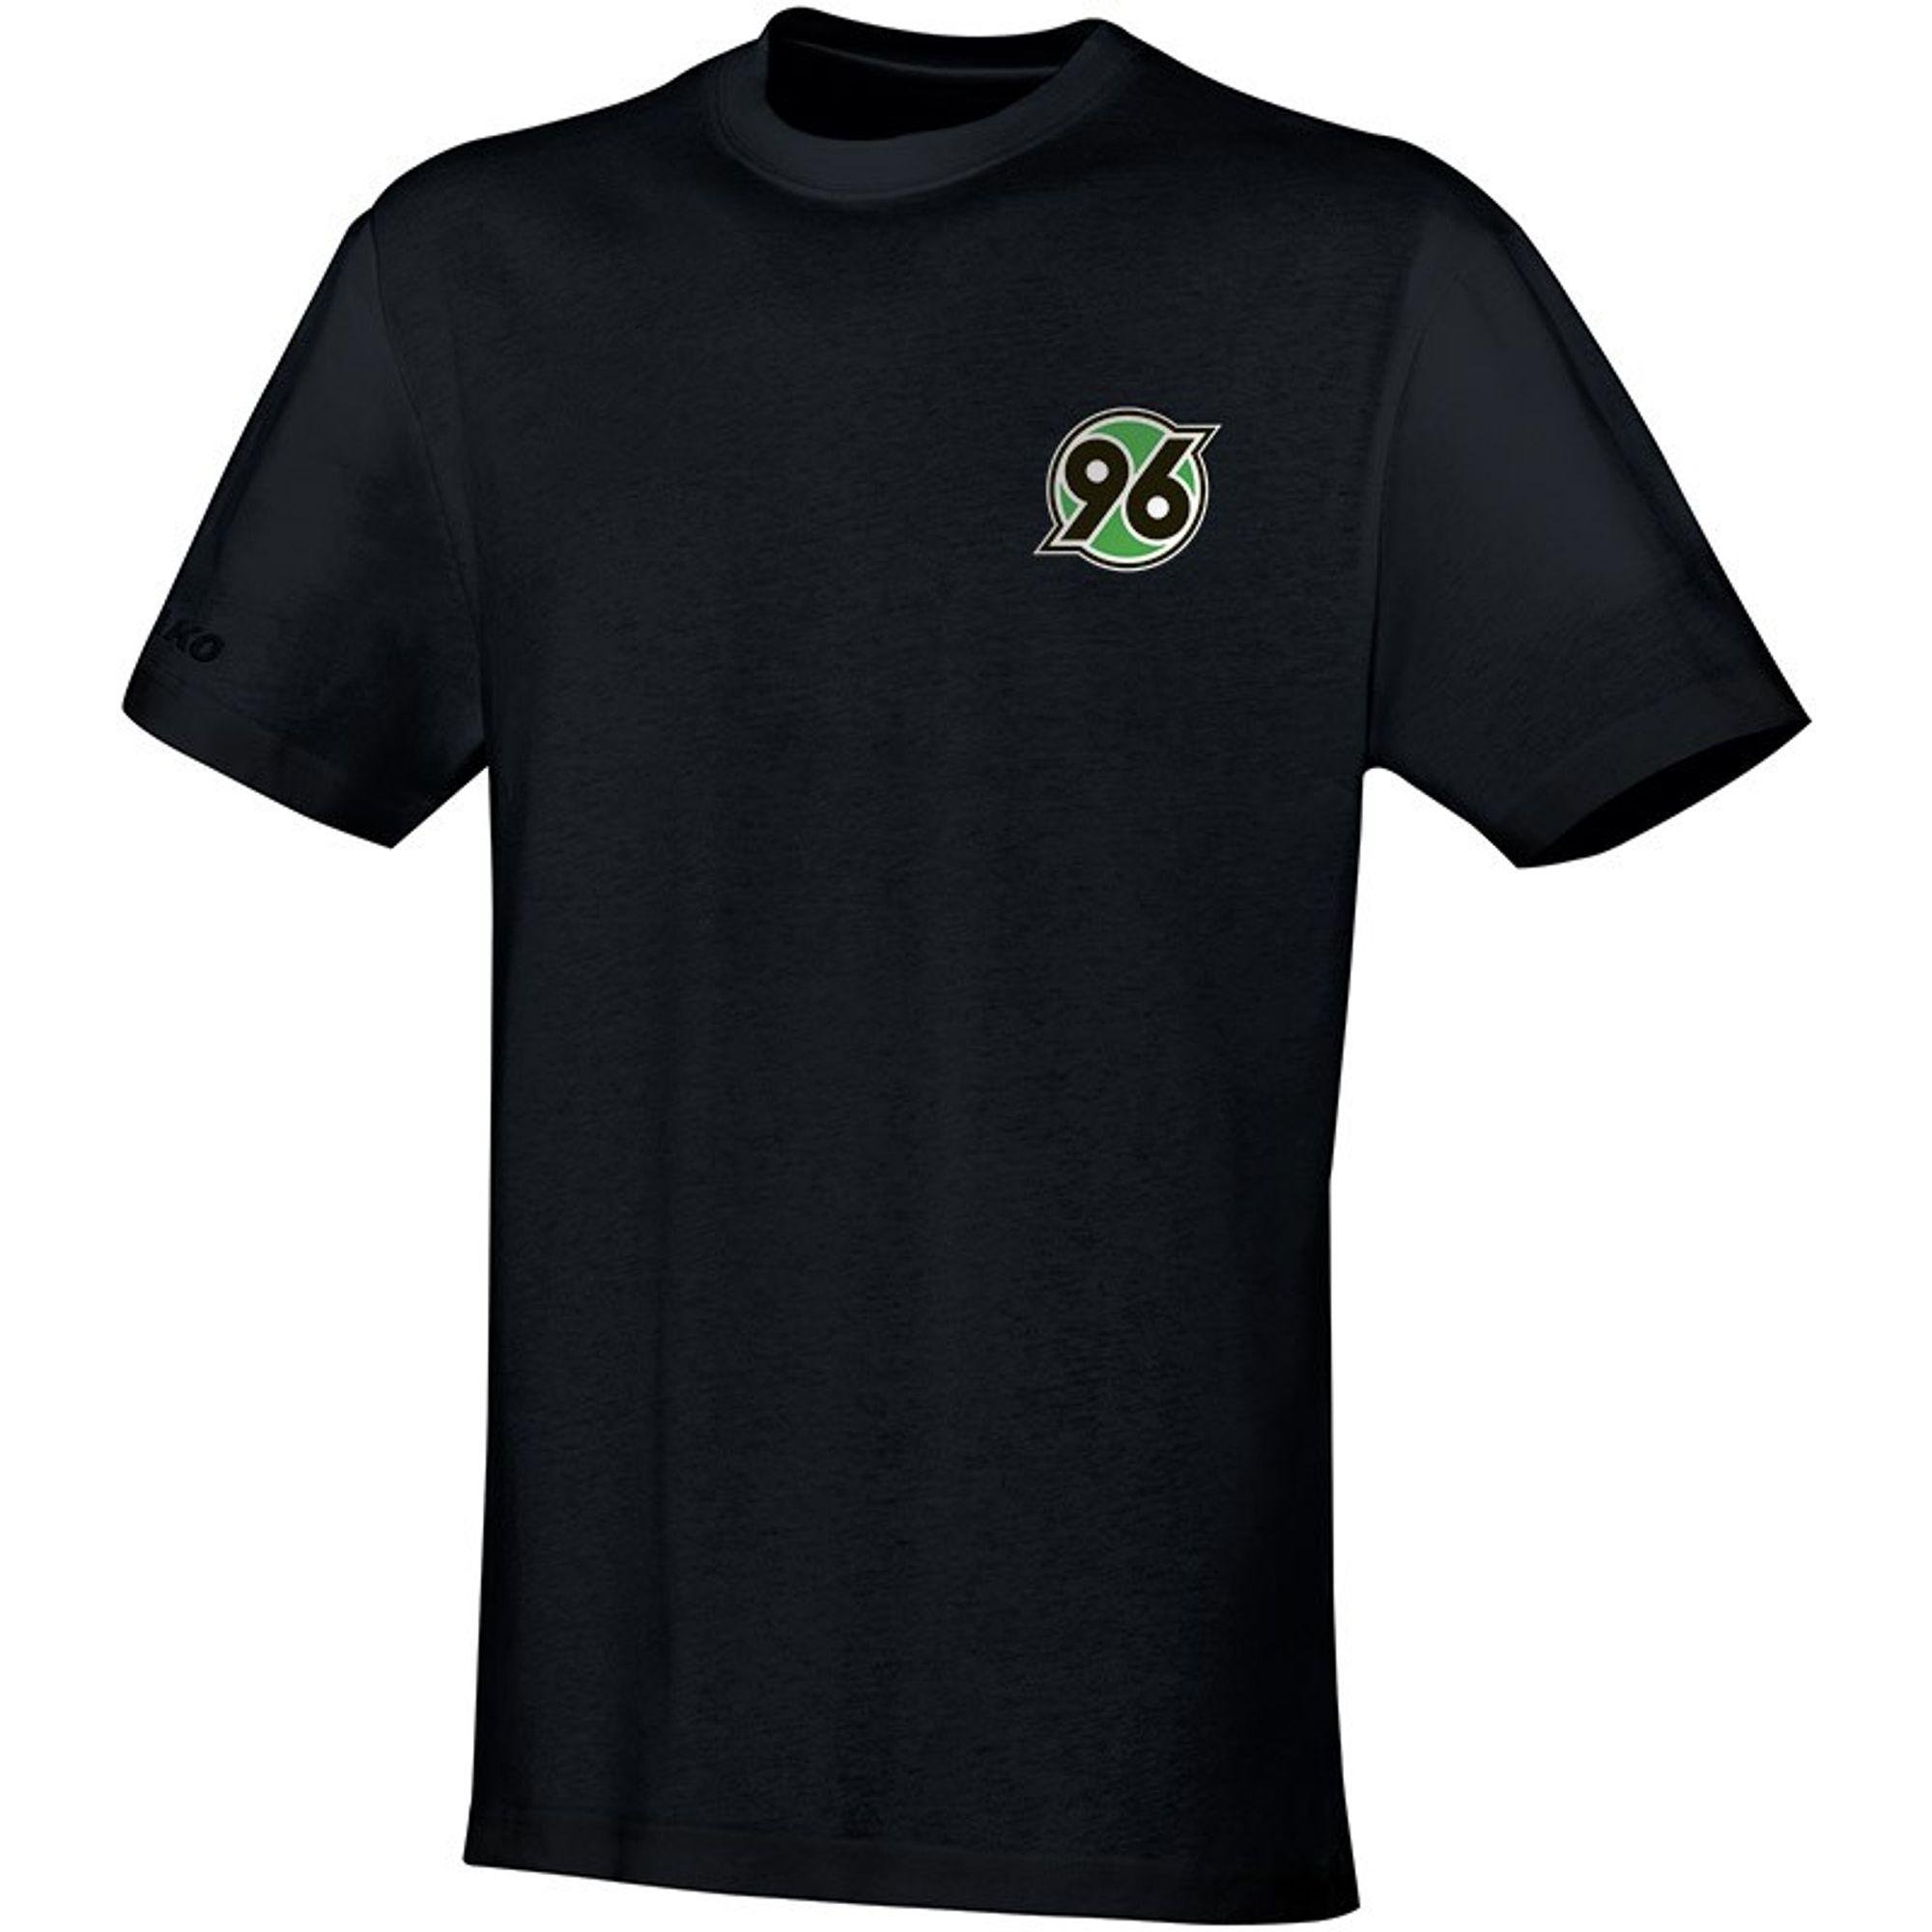 Jako Hannover 96 T-Shirt Team Saison 2015/2016 - schwarz